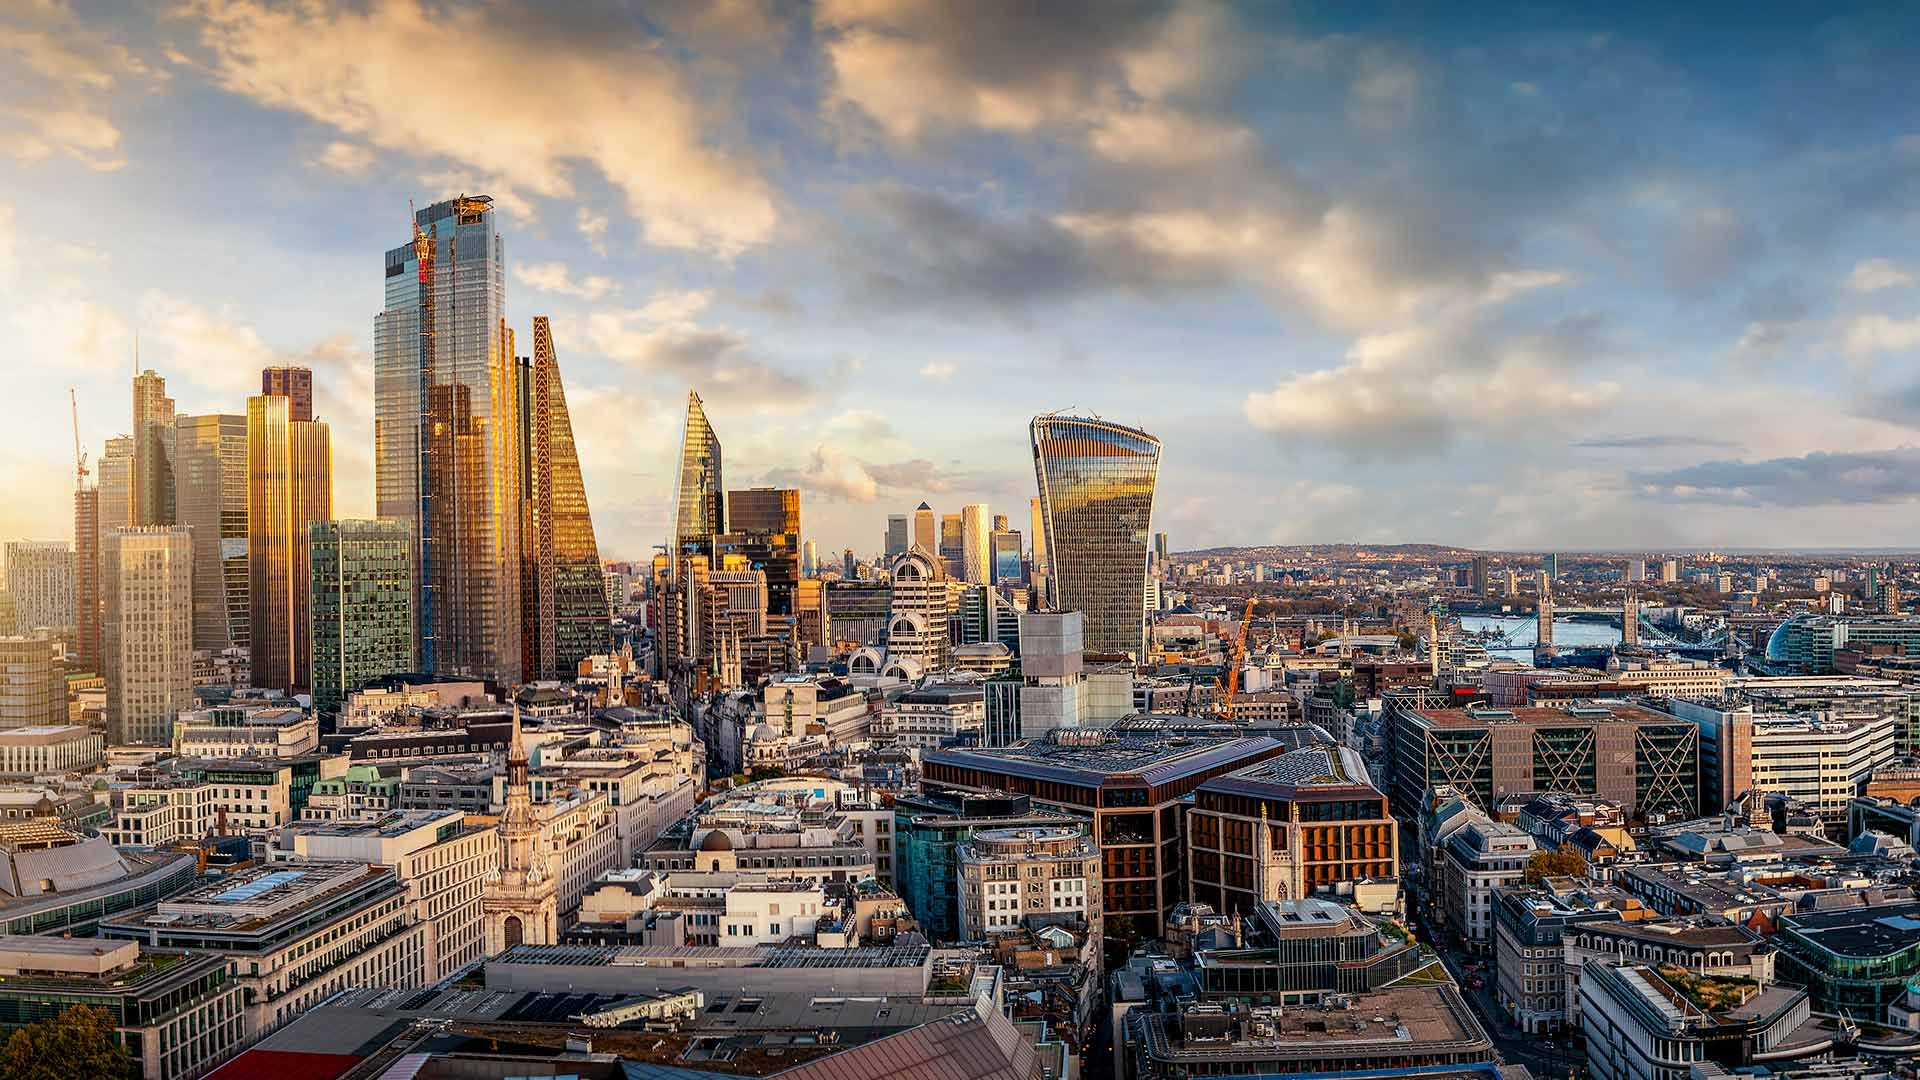 Cityscape of London at sunrise